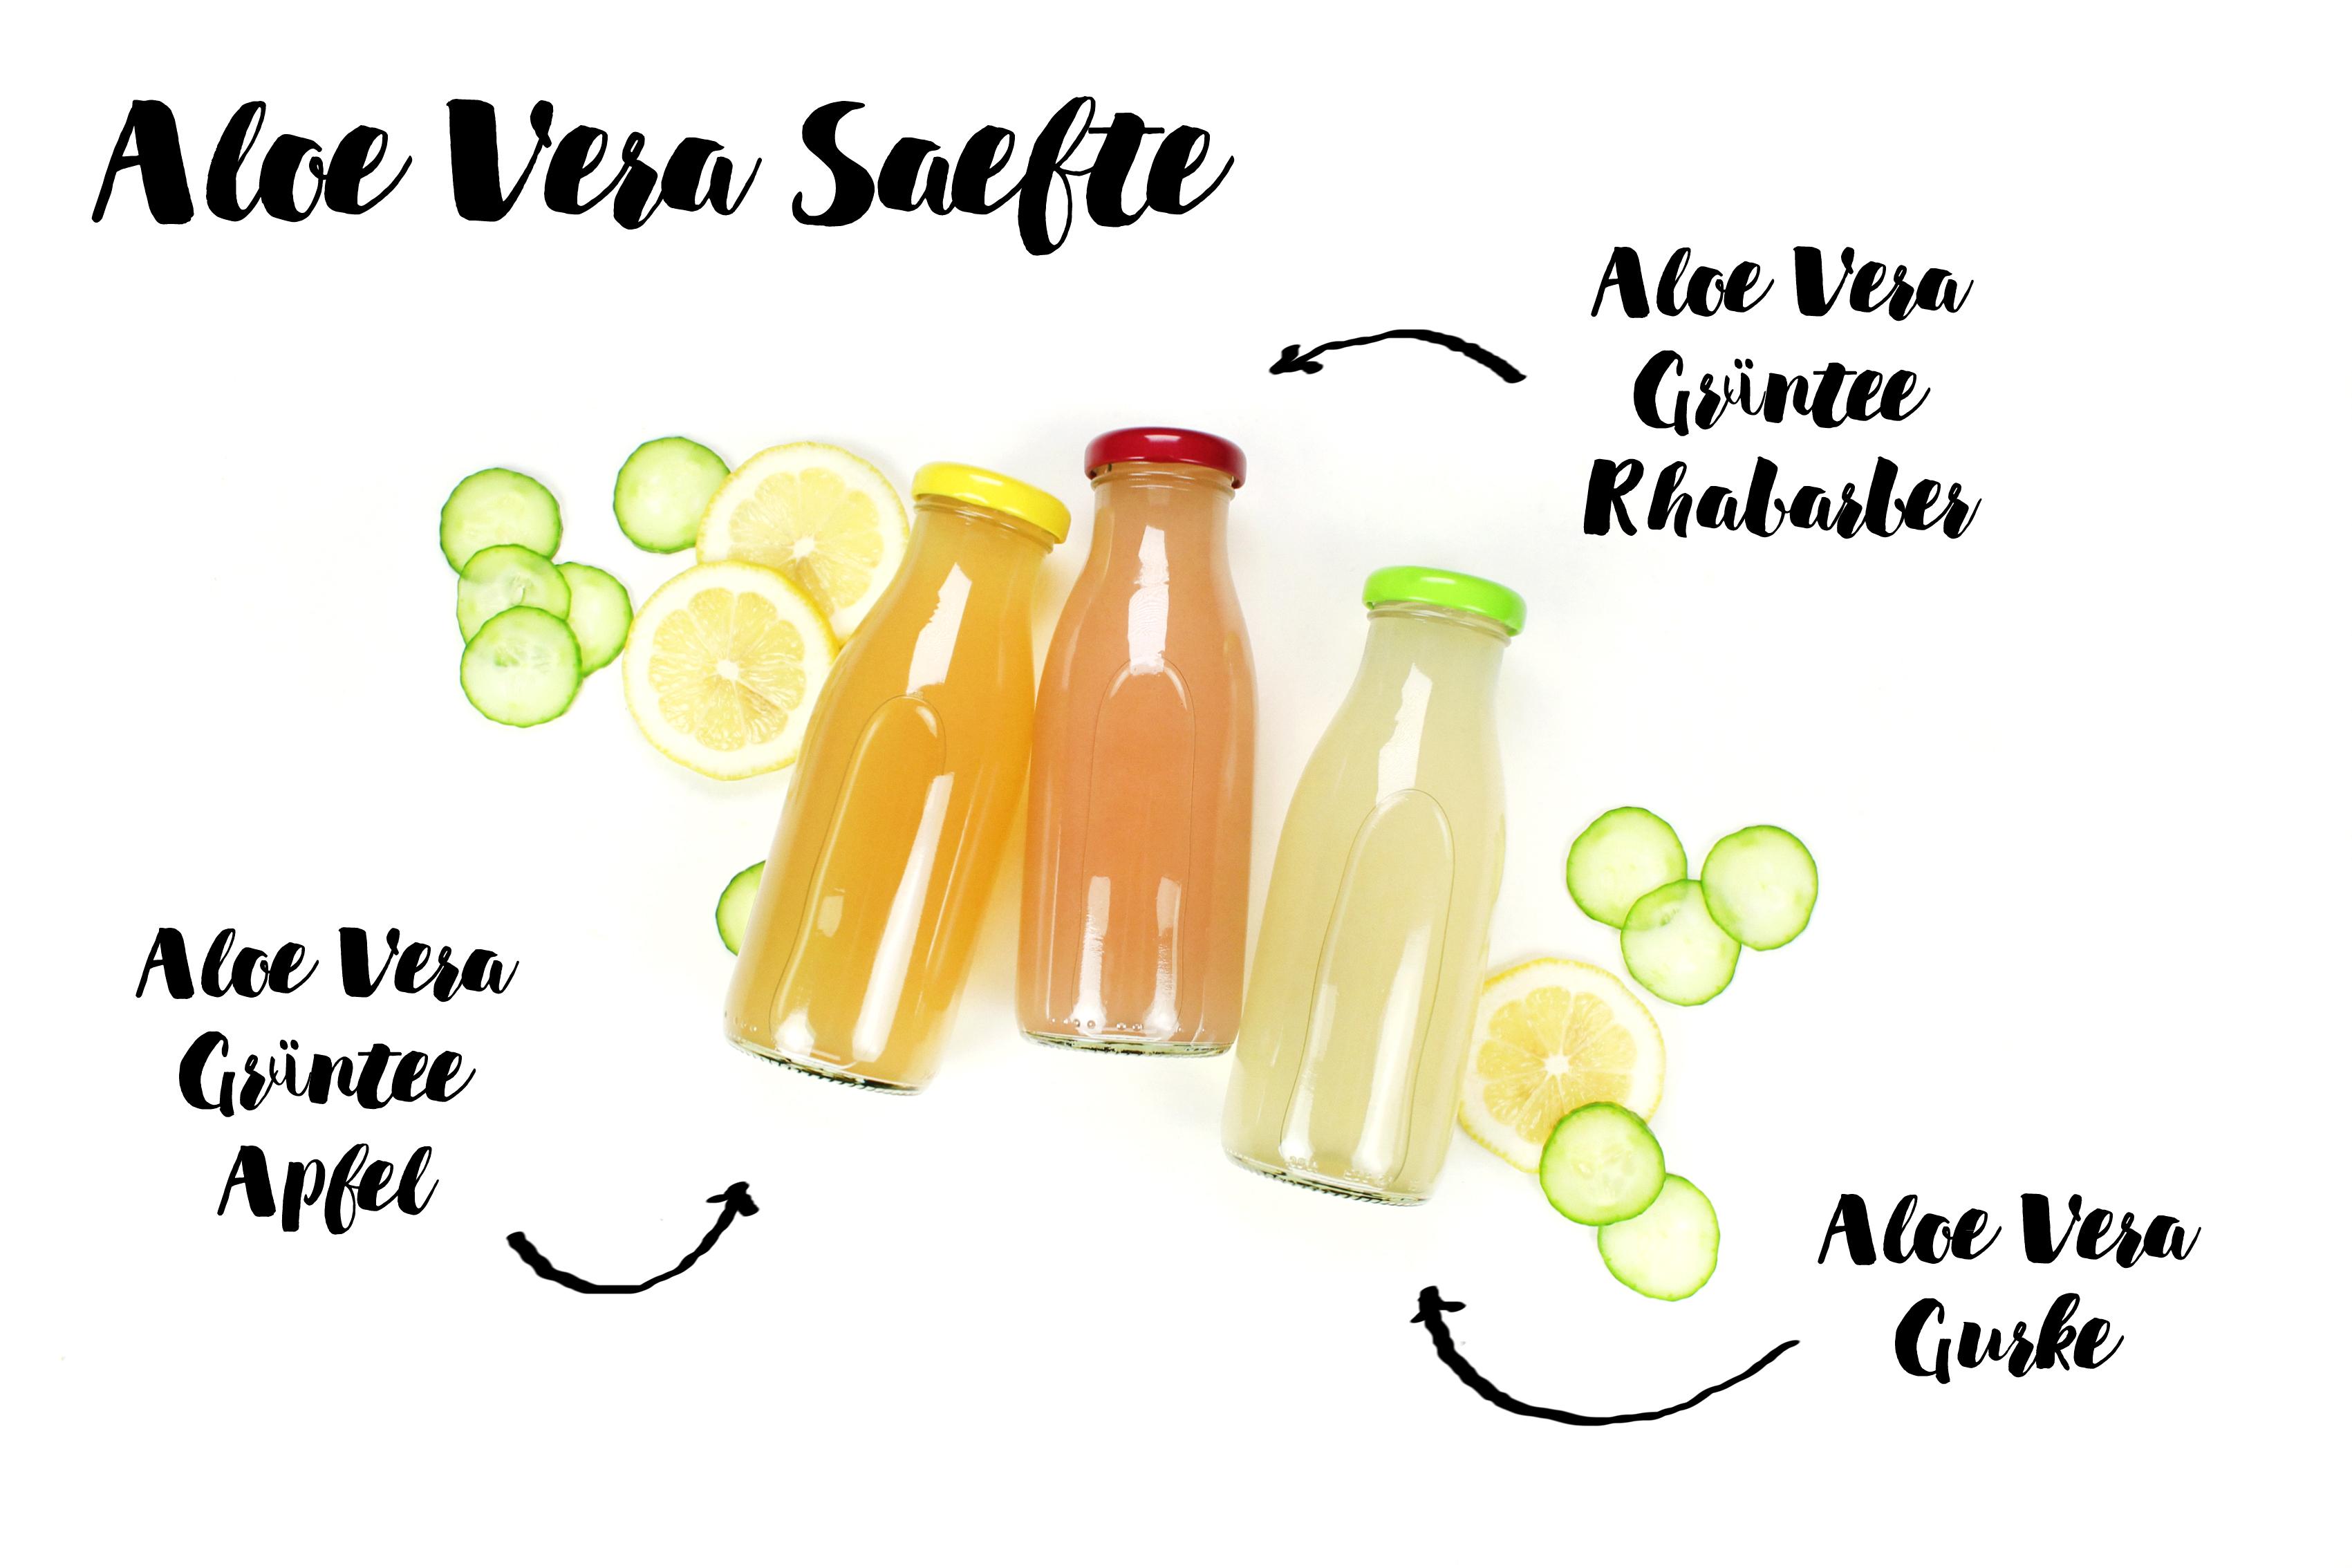 rezepte-mit-aloe-vera-saft